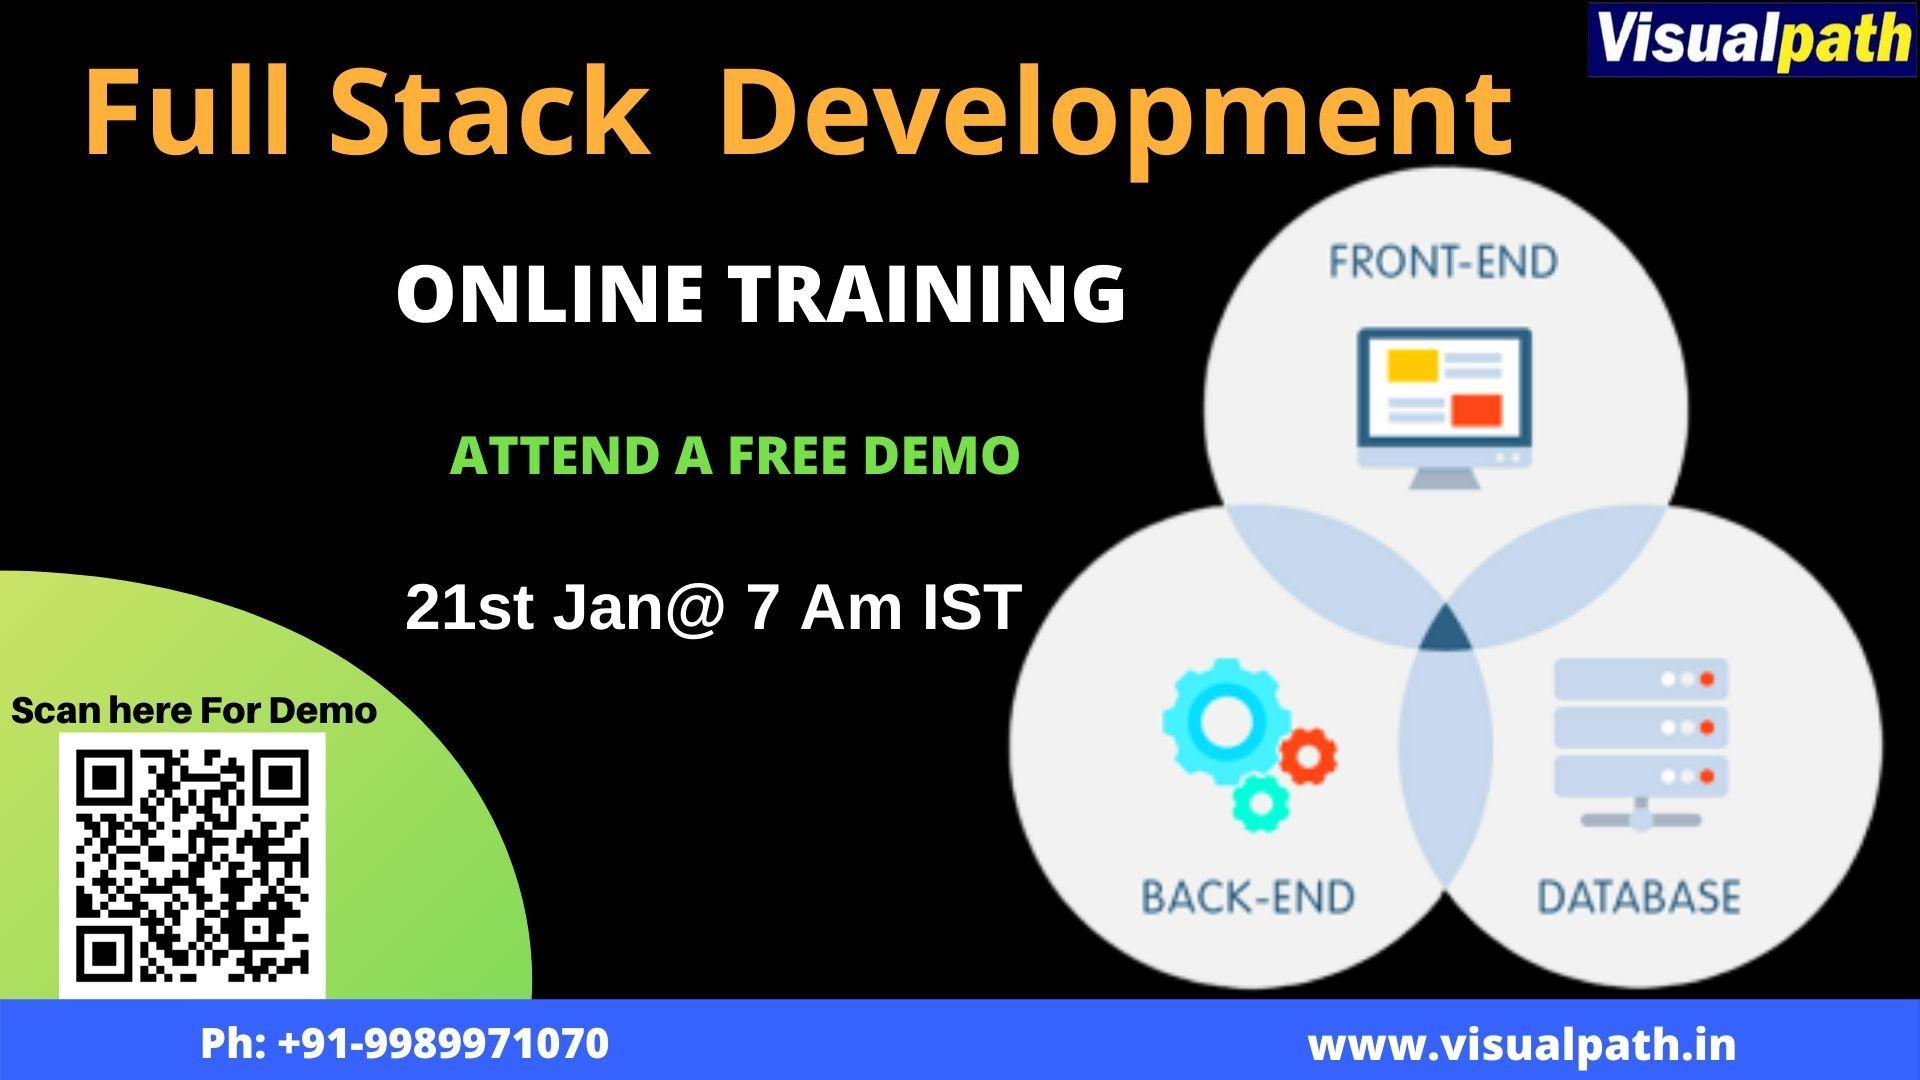 Visualpath_IT is the best Fullstack training institute